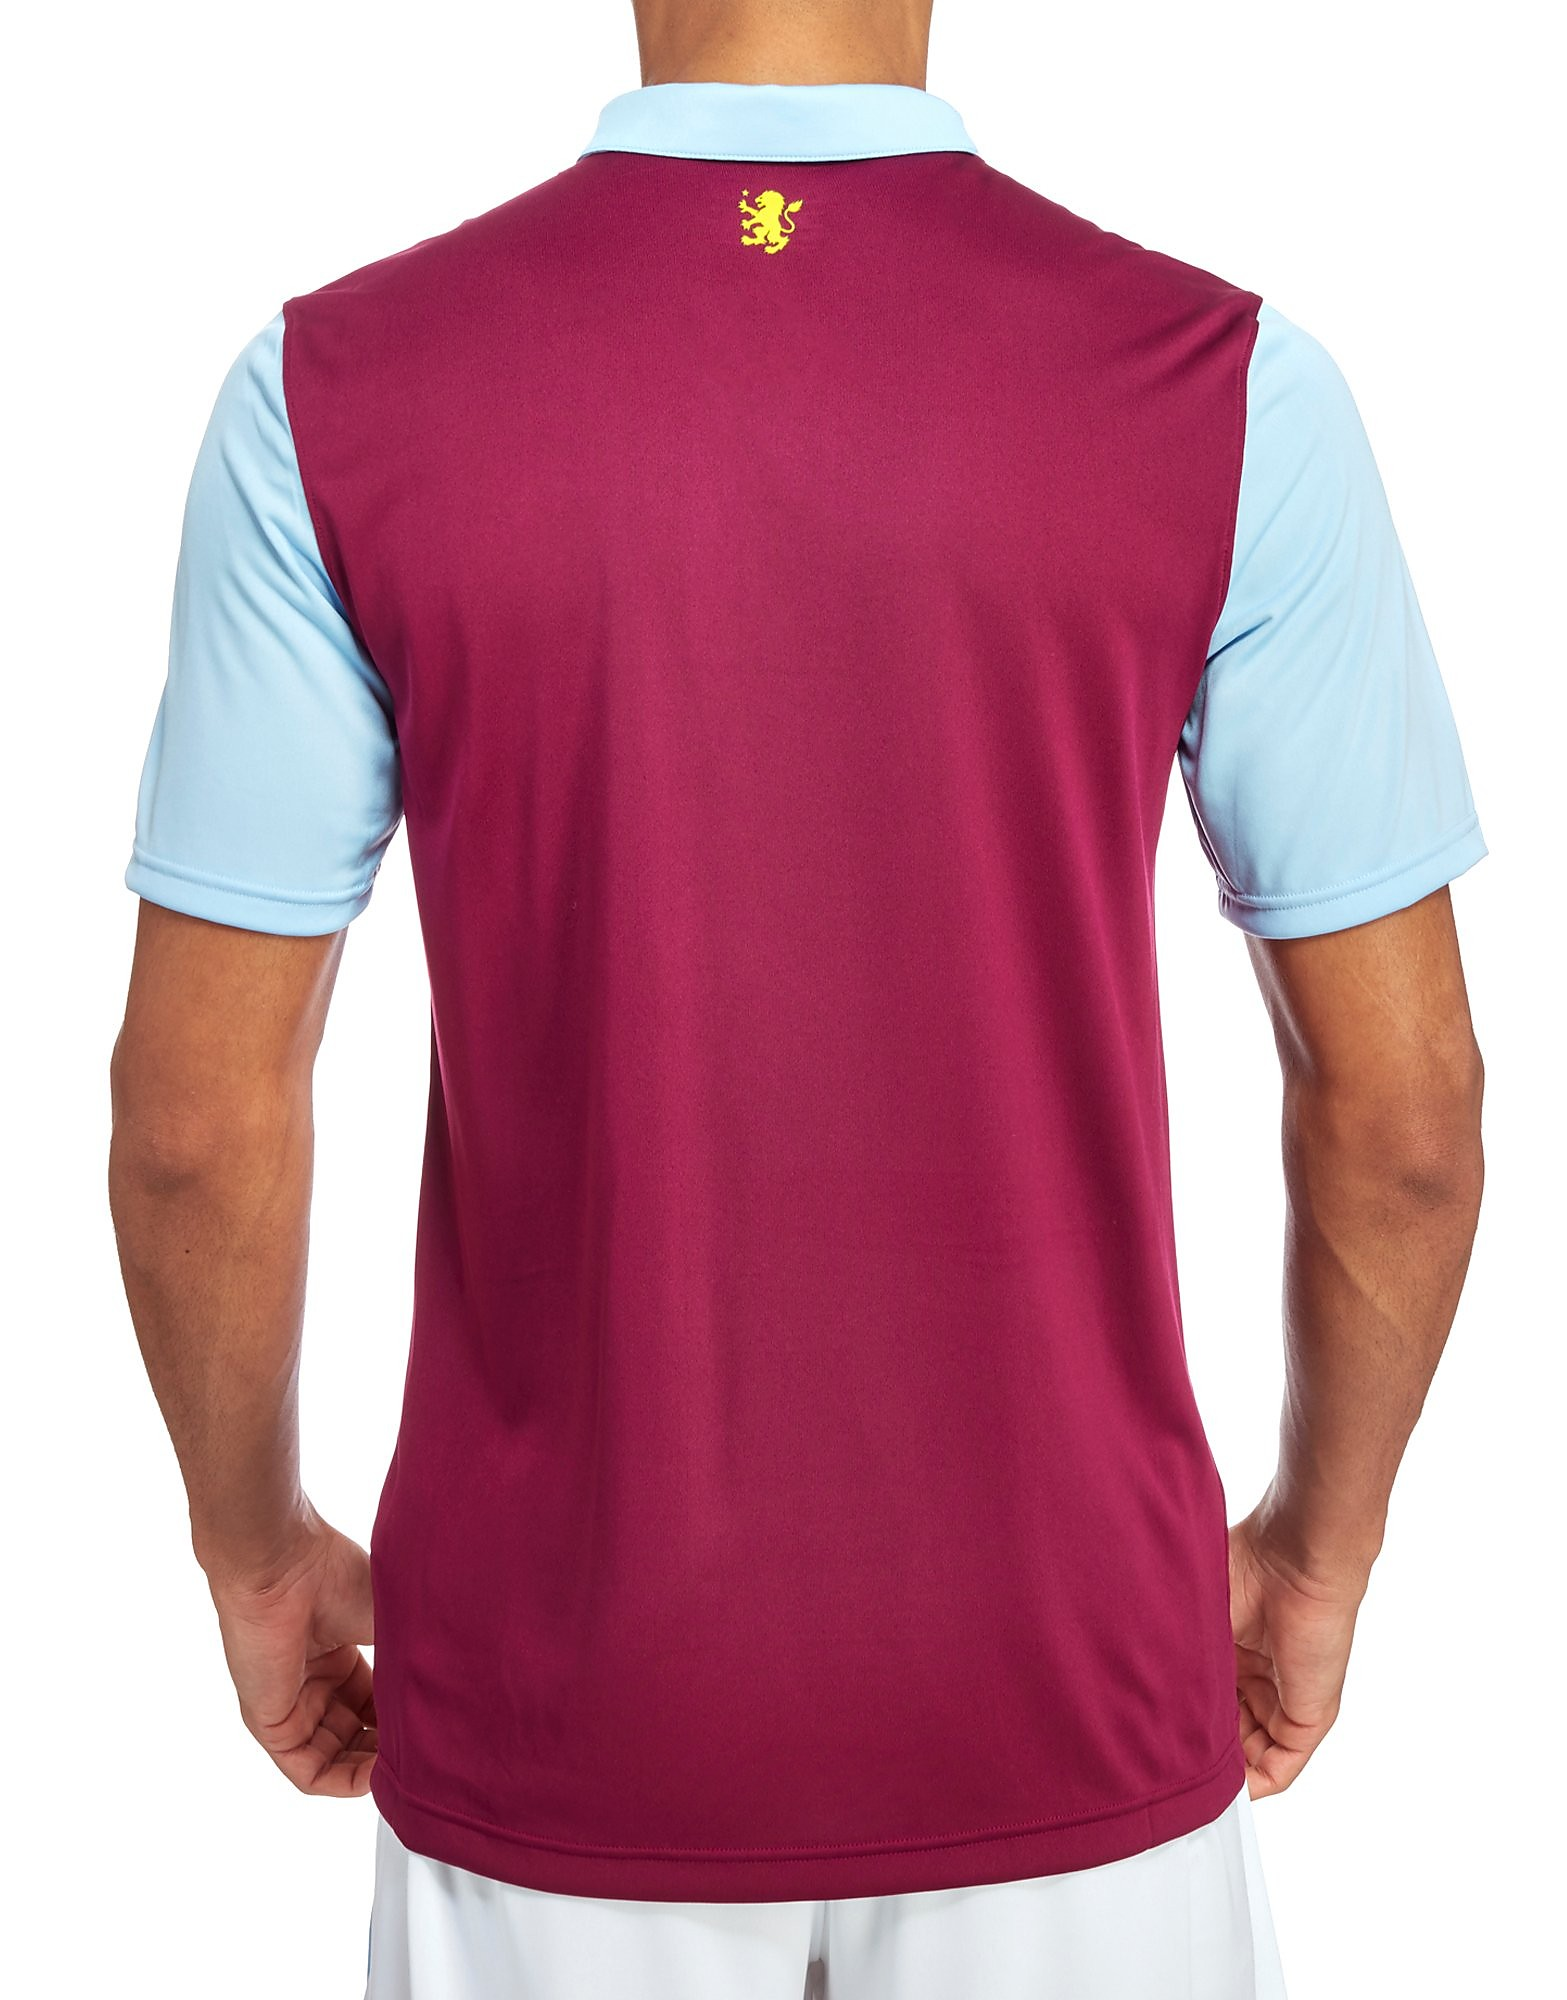 Under Armour Aston Villa FC 2016/17 Home Shirt